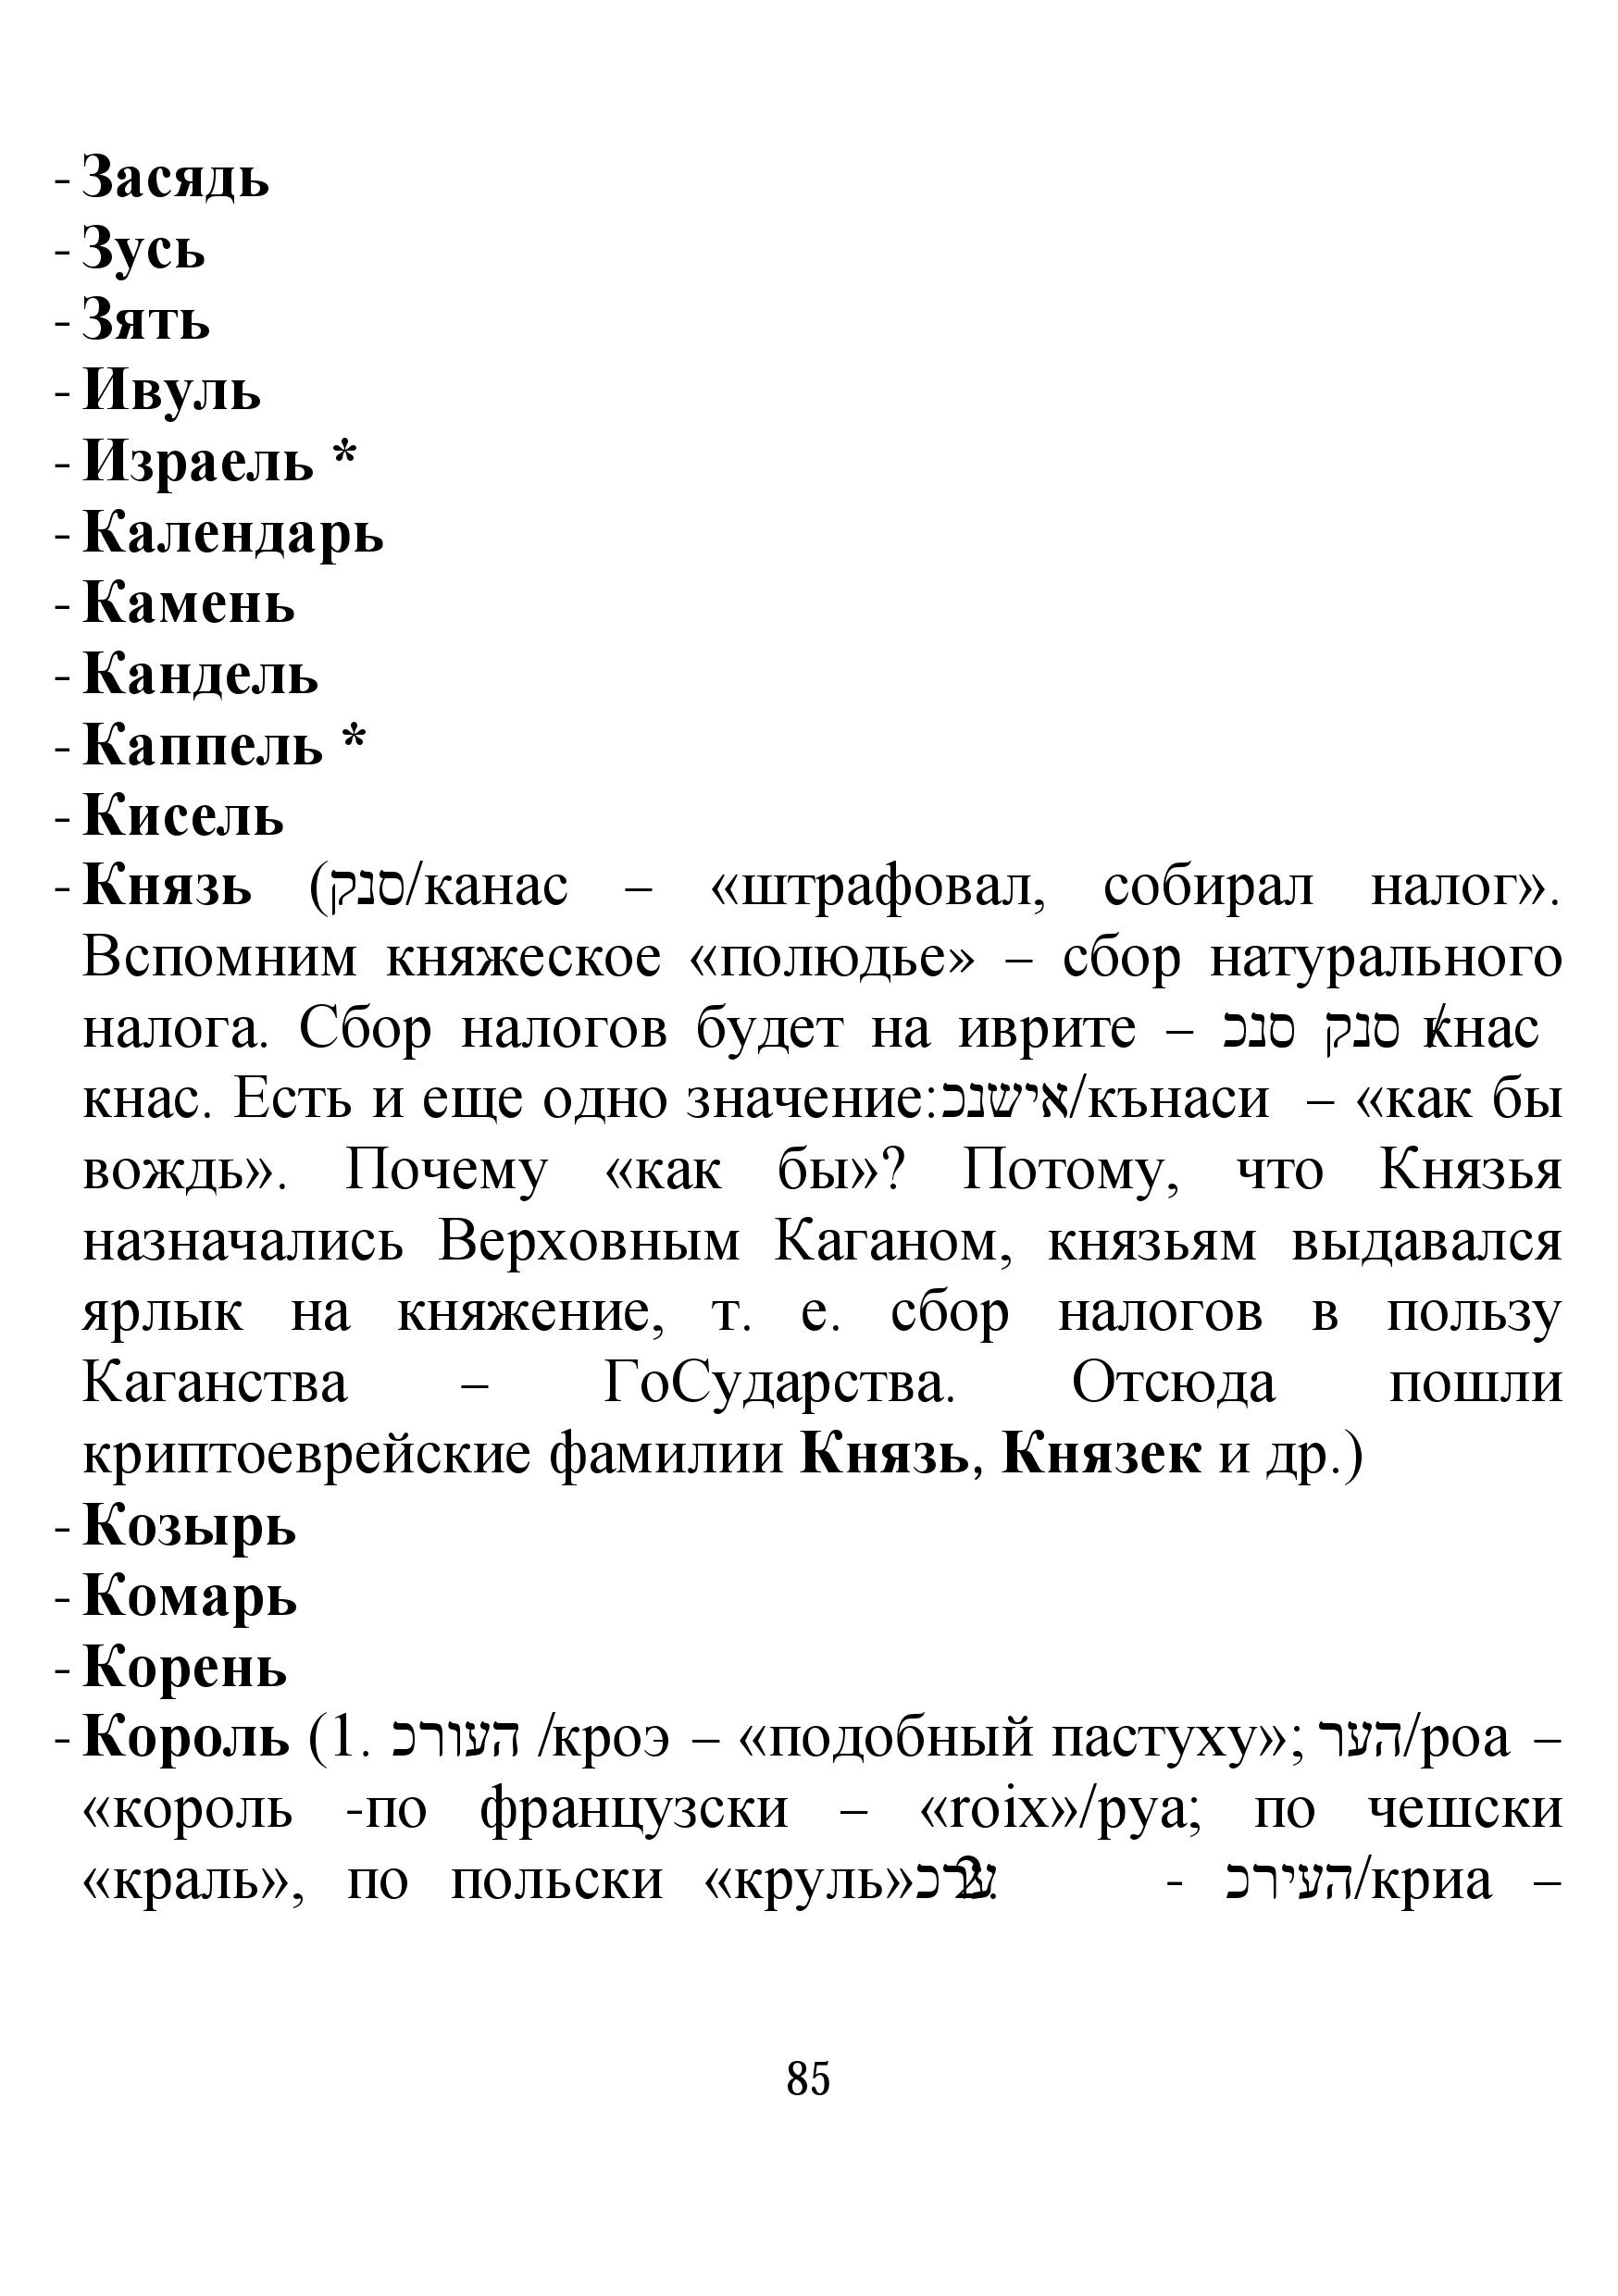 http://s5.uploads.ru/Lrw8k.jpg